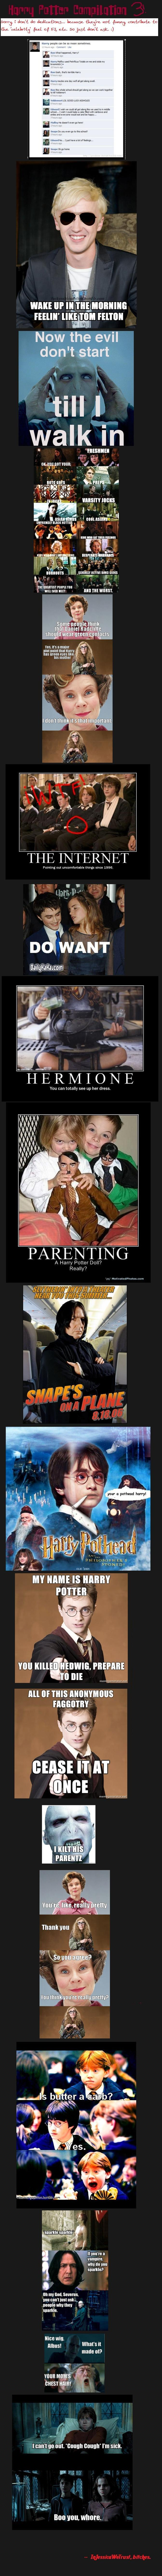 Harry Potter Comp Part 3. Part 1: funnyjunk.com/funny_pictures/617360/Harry+Potter+Comp/<br /> Part 2: funnyjunk.com/funny_pictures/620080/Harr y+Potter+C